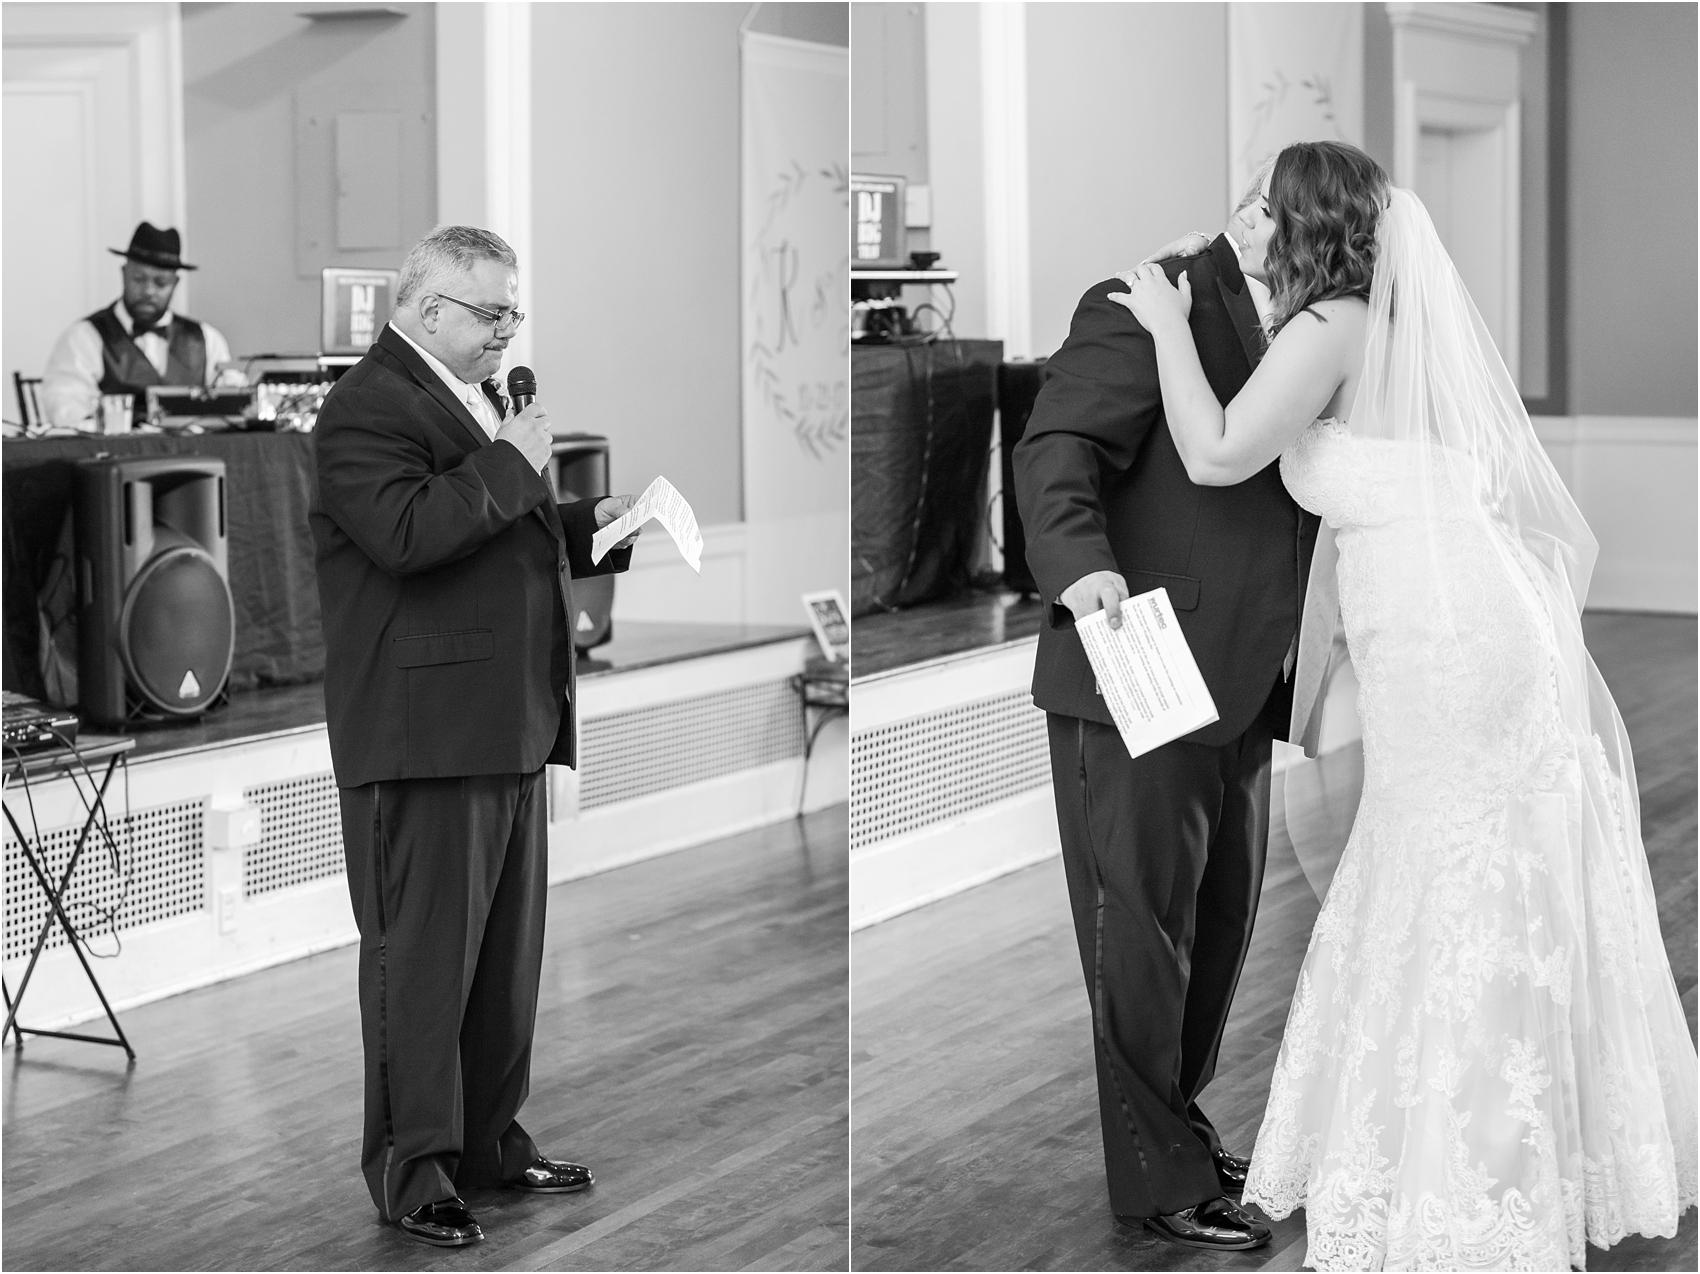 elegant-and-romantic-fall-wedding-photos-at-st-marys-catholic-church-in-monroe-michigan-by-courtney-carolyn-photography_0072.jpg